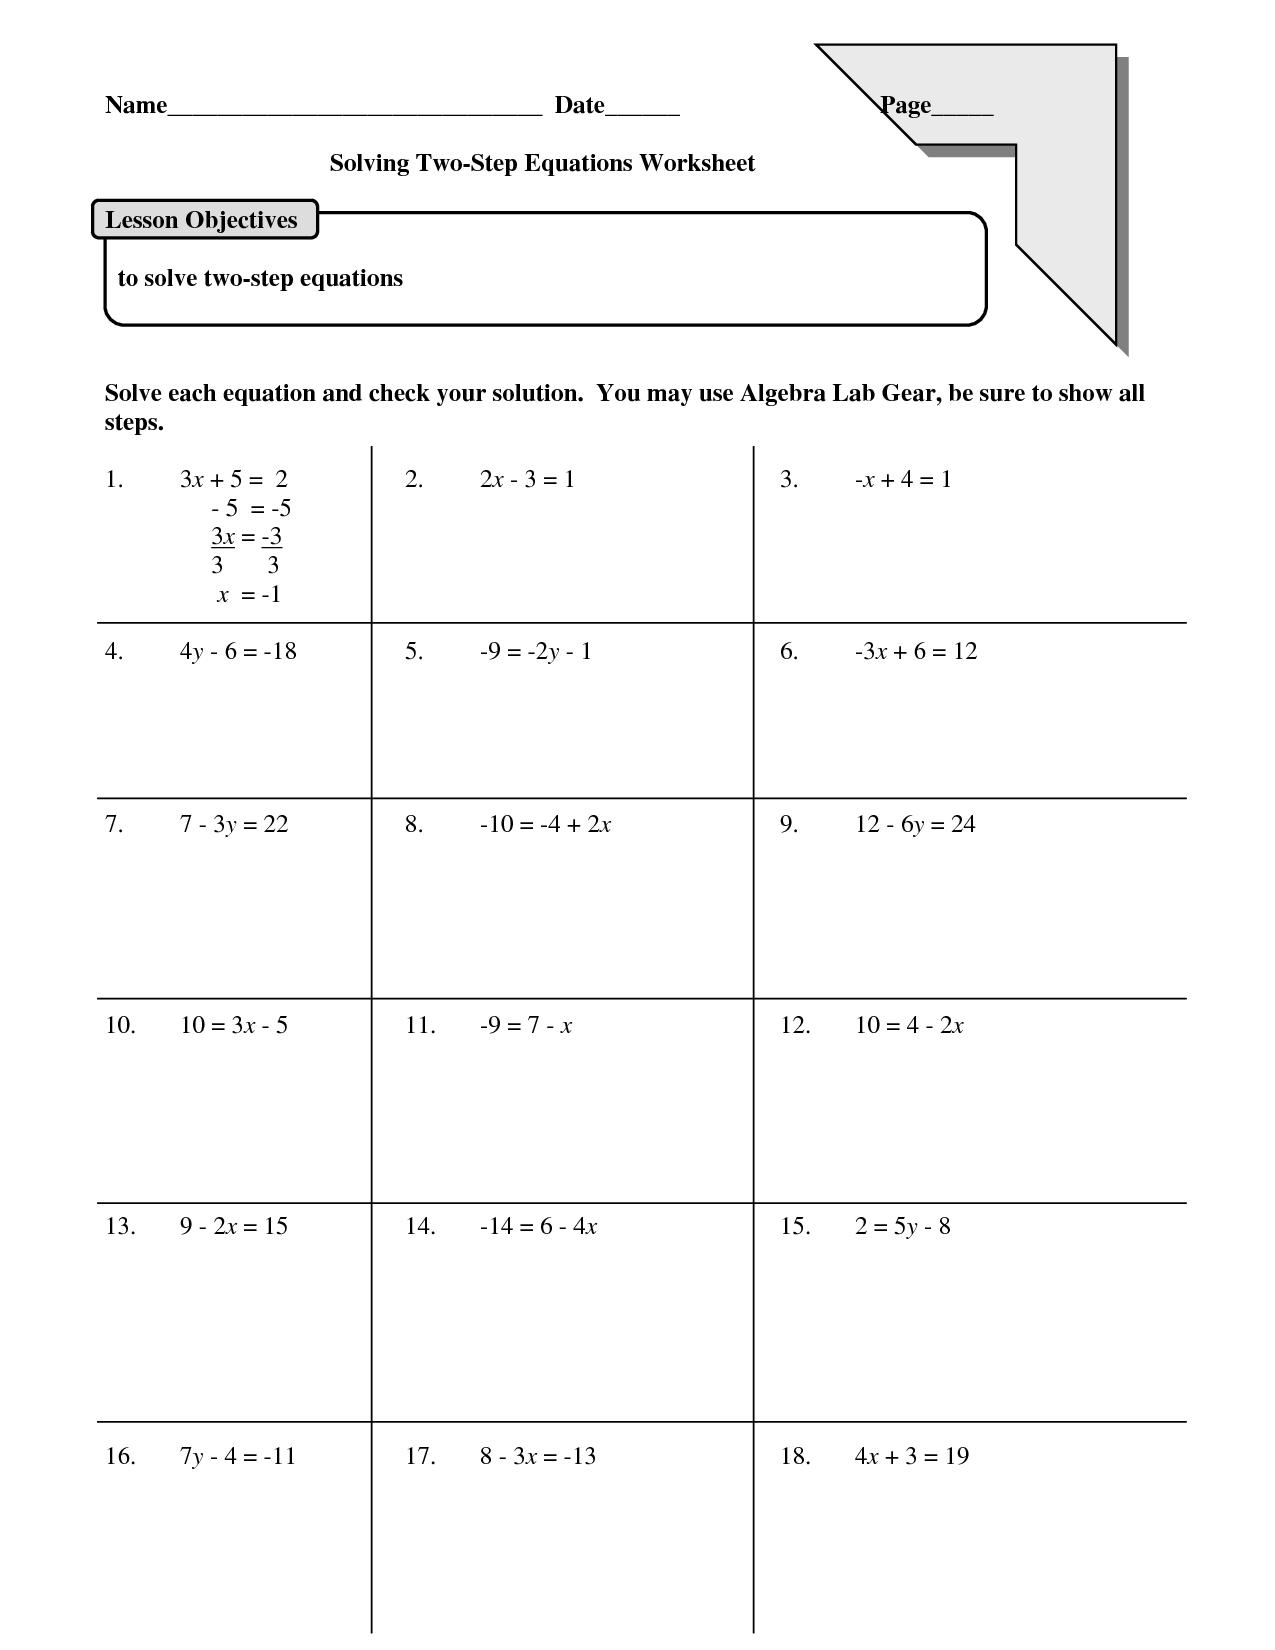 Solving 2 Step Equations Worksheets